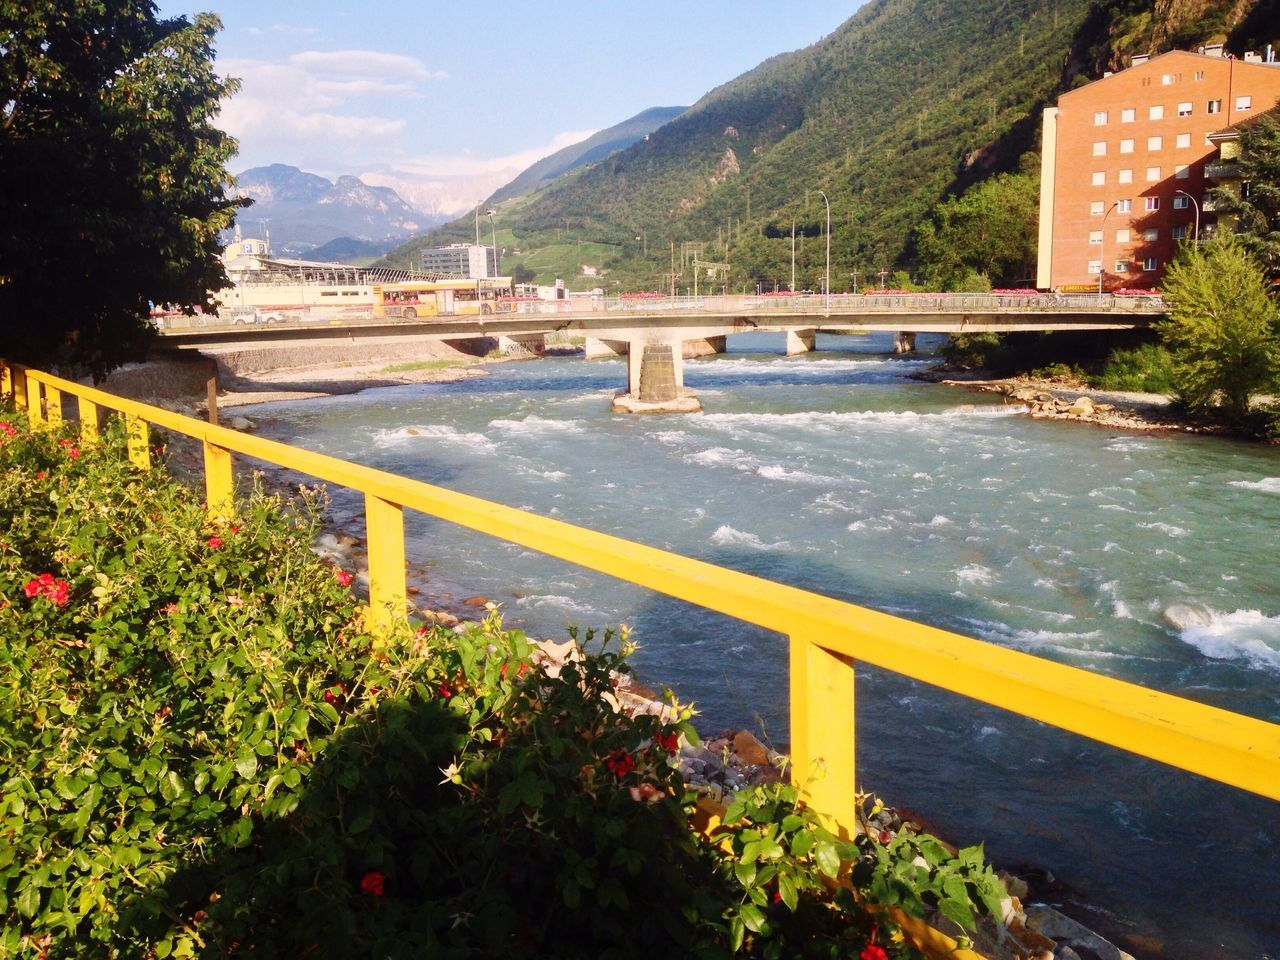 188/365 July 7 2017 One Year Project Bolzano - Bozen Bolzano South Tyrol Italy Mountain Mountain Range Water Day Nature Beauty In Nature Tree Outdoors No People Plant Scenics Sky Flower